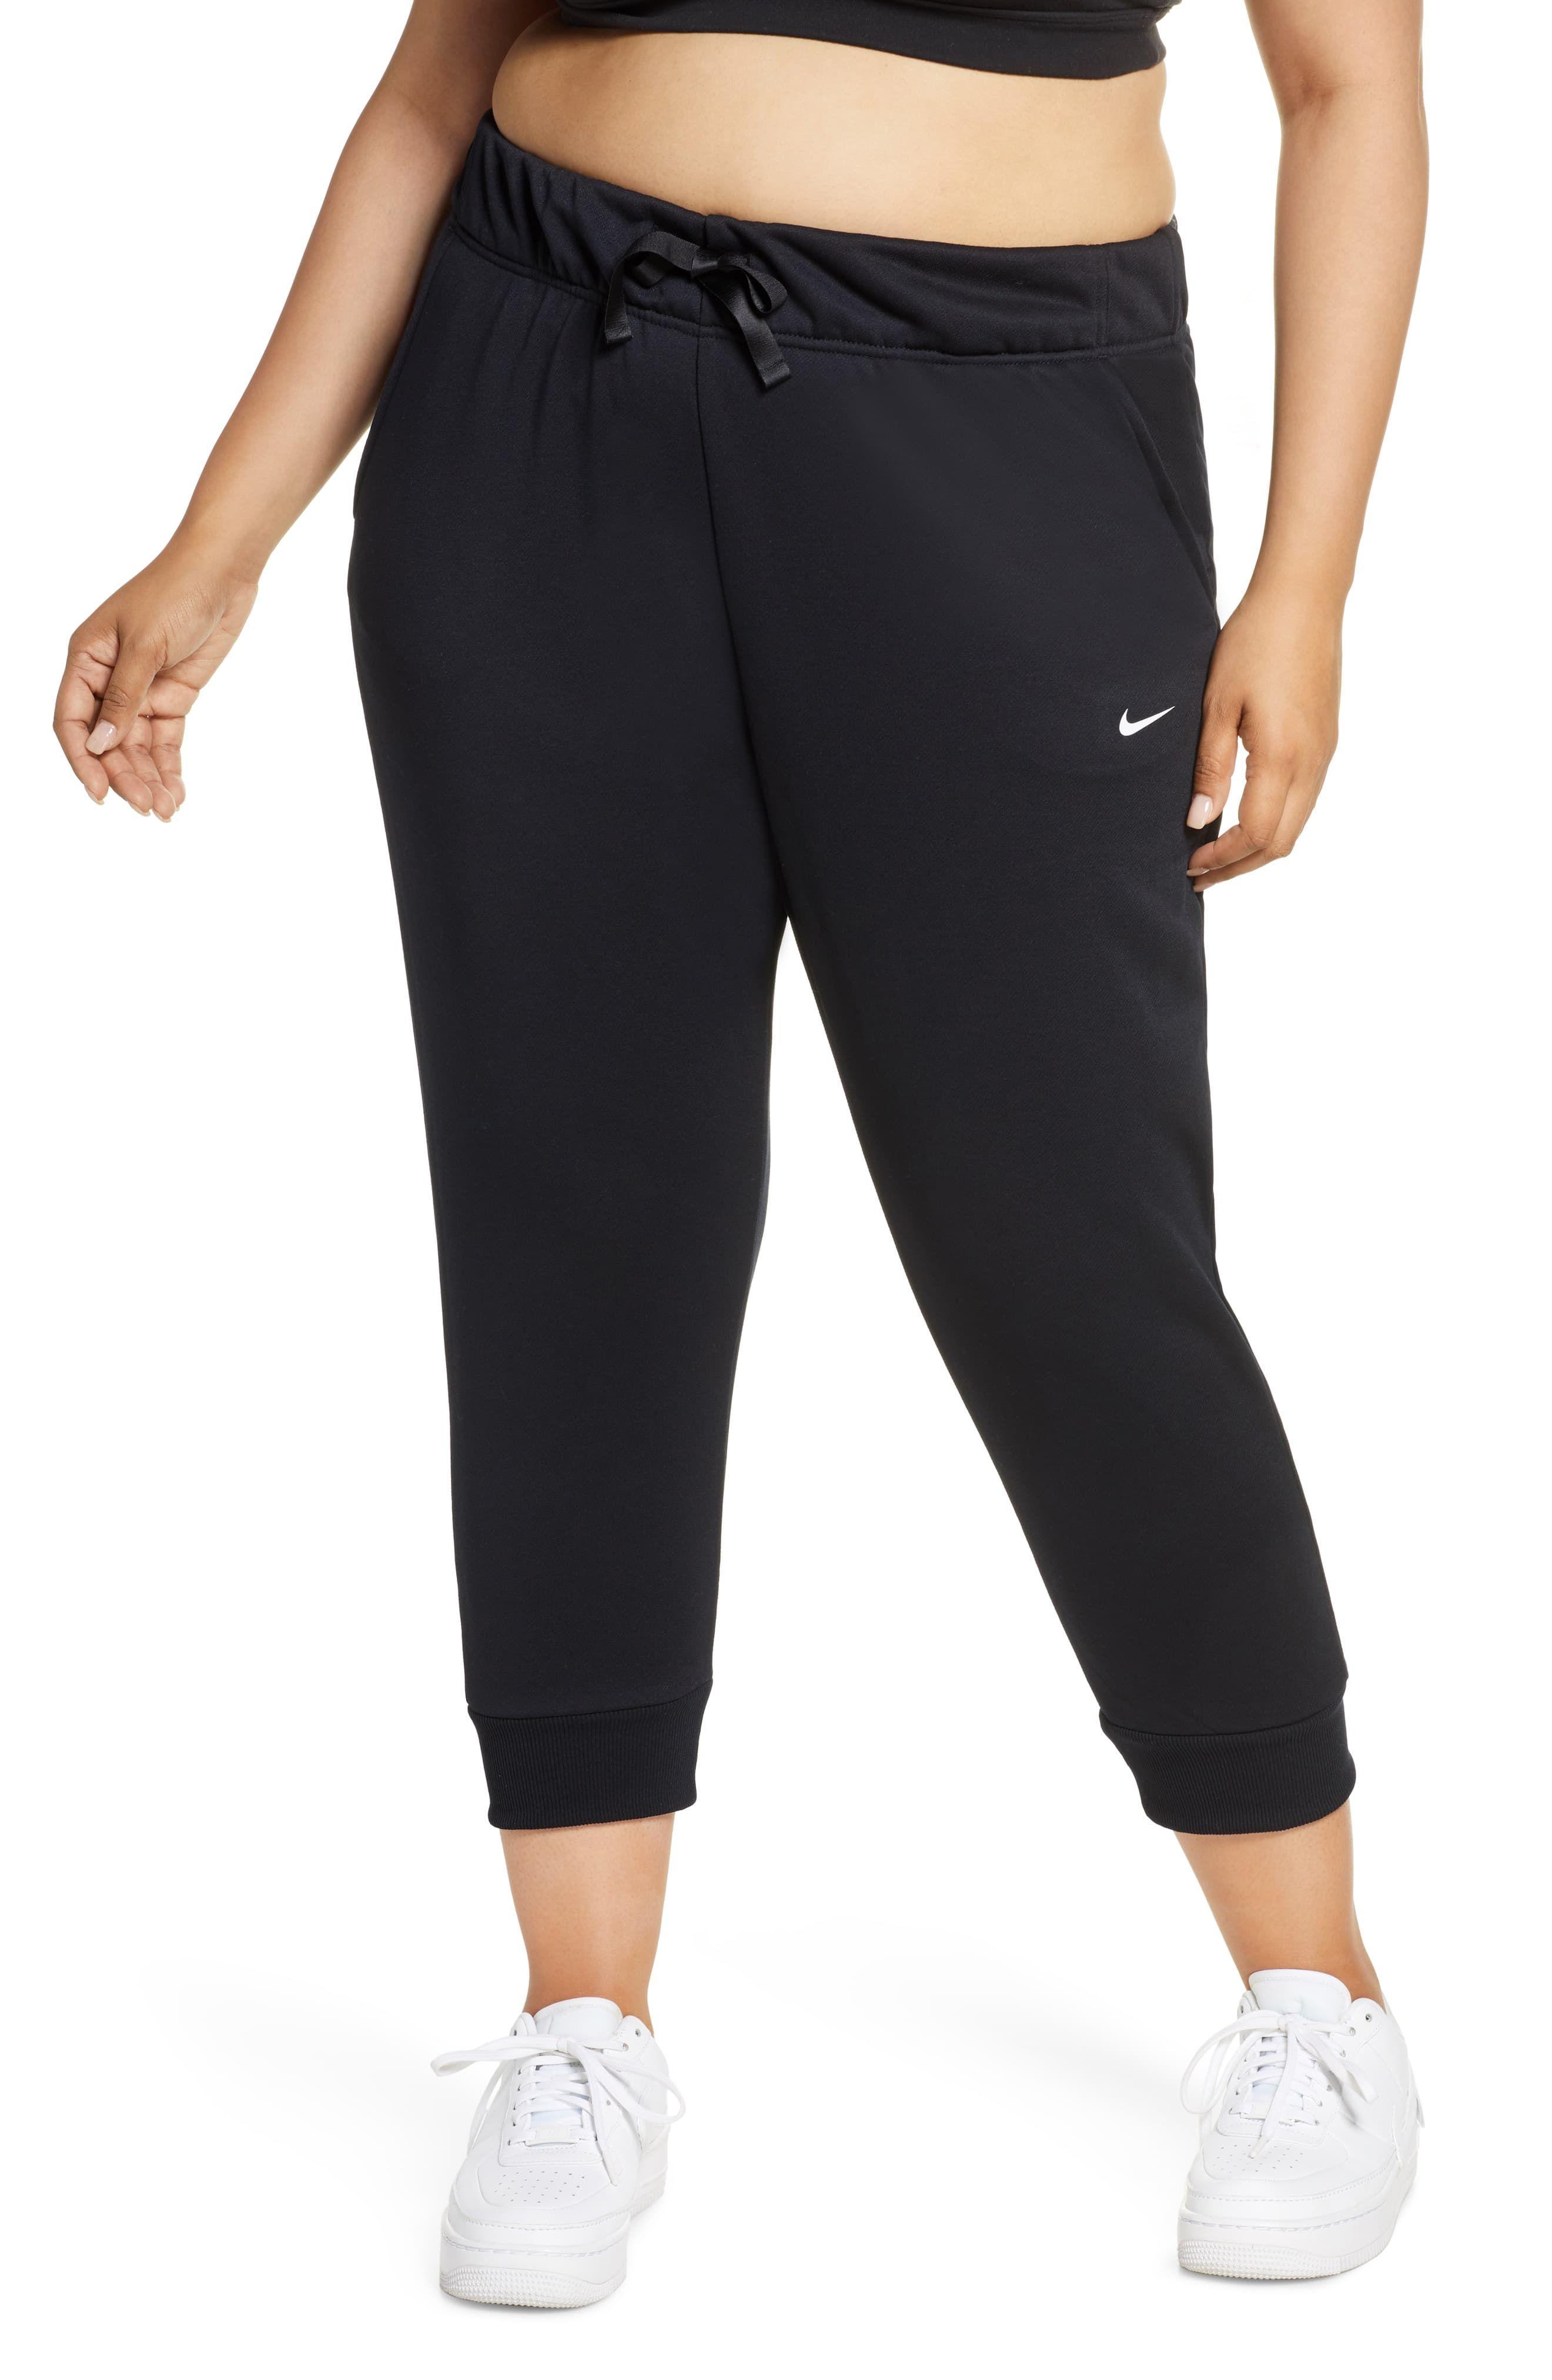 united kingdom Official Website utterly stylish Dri-FIT One Crop Fleece Pants